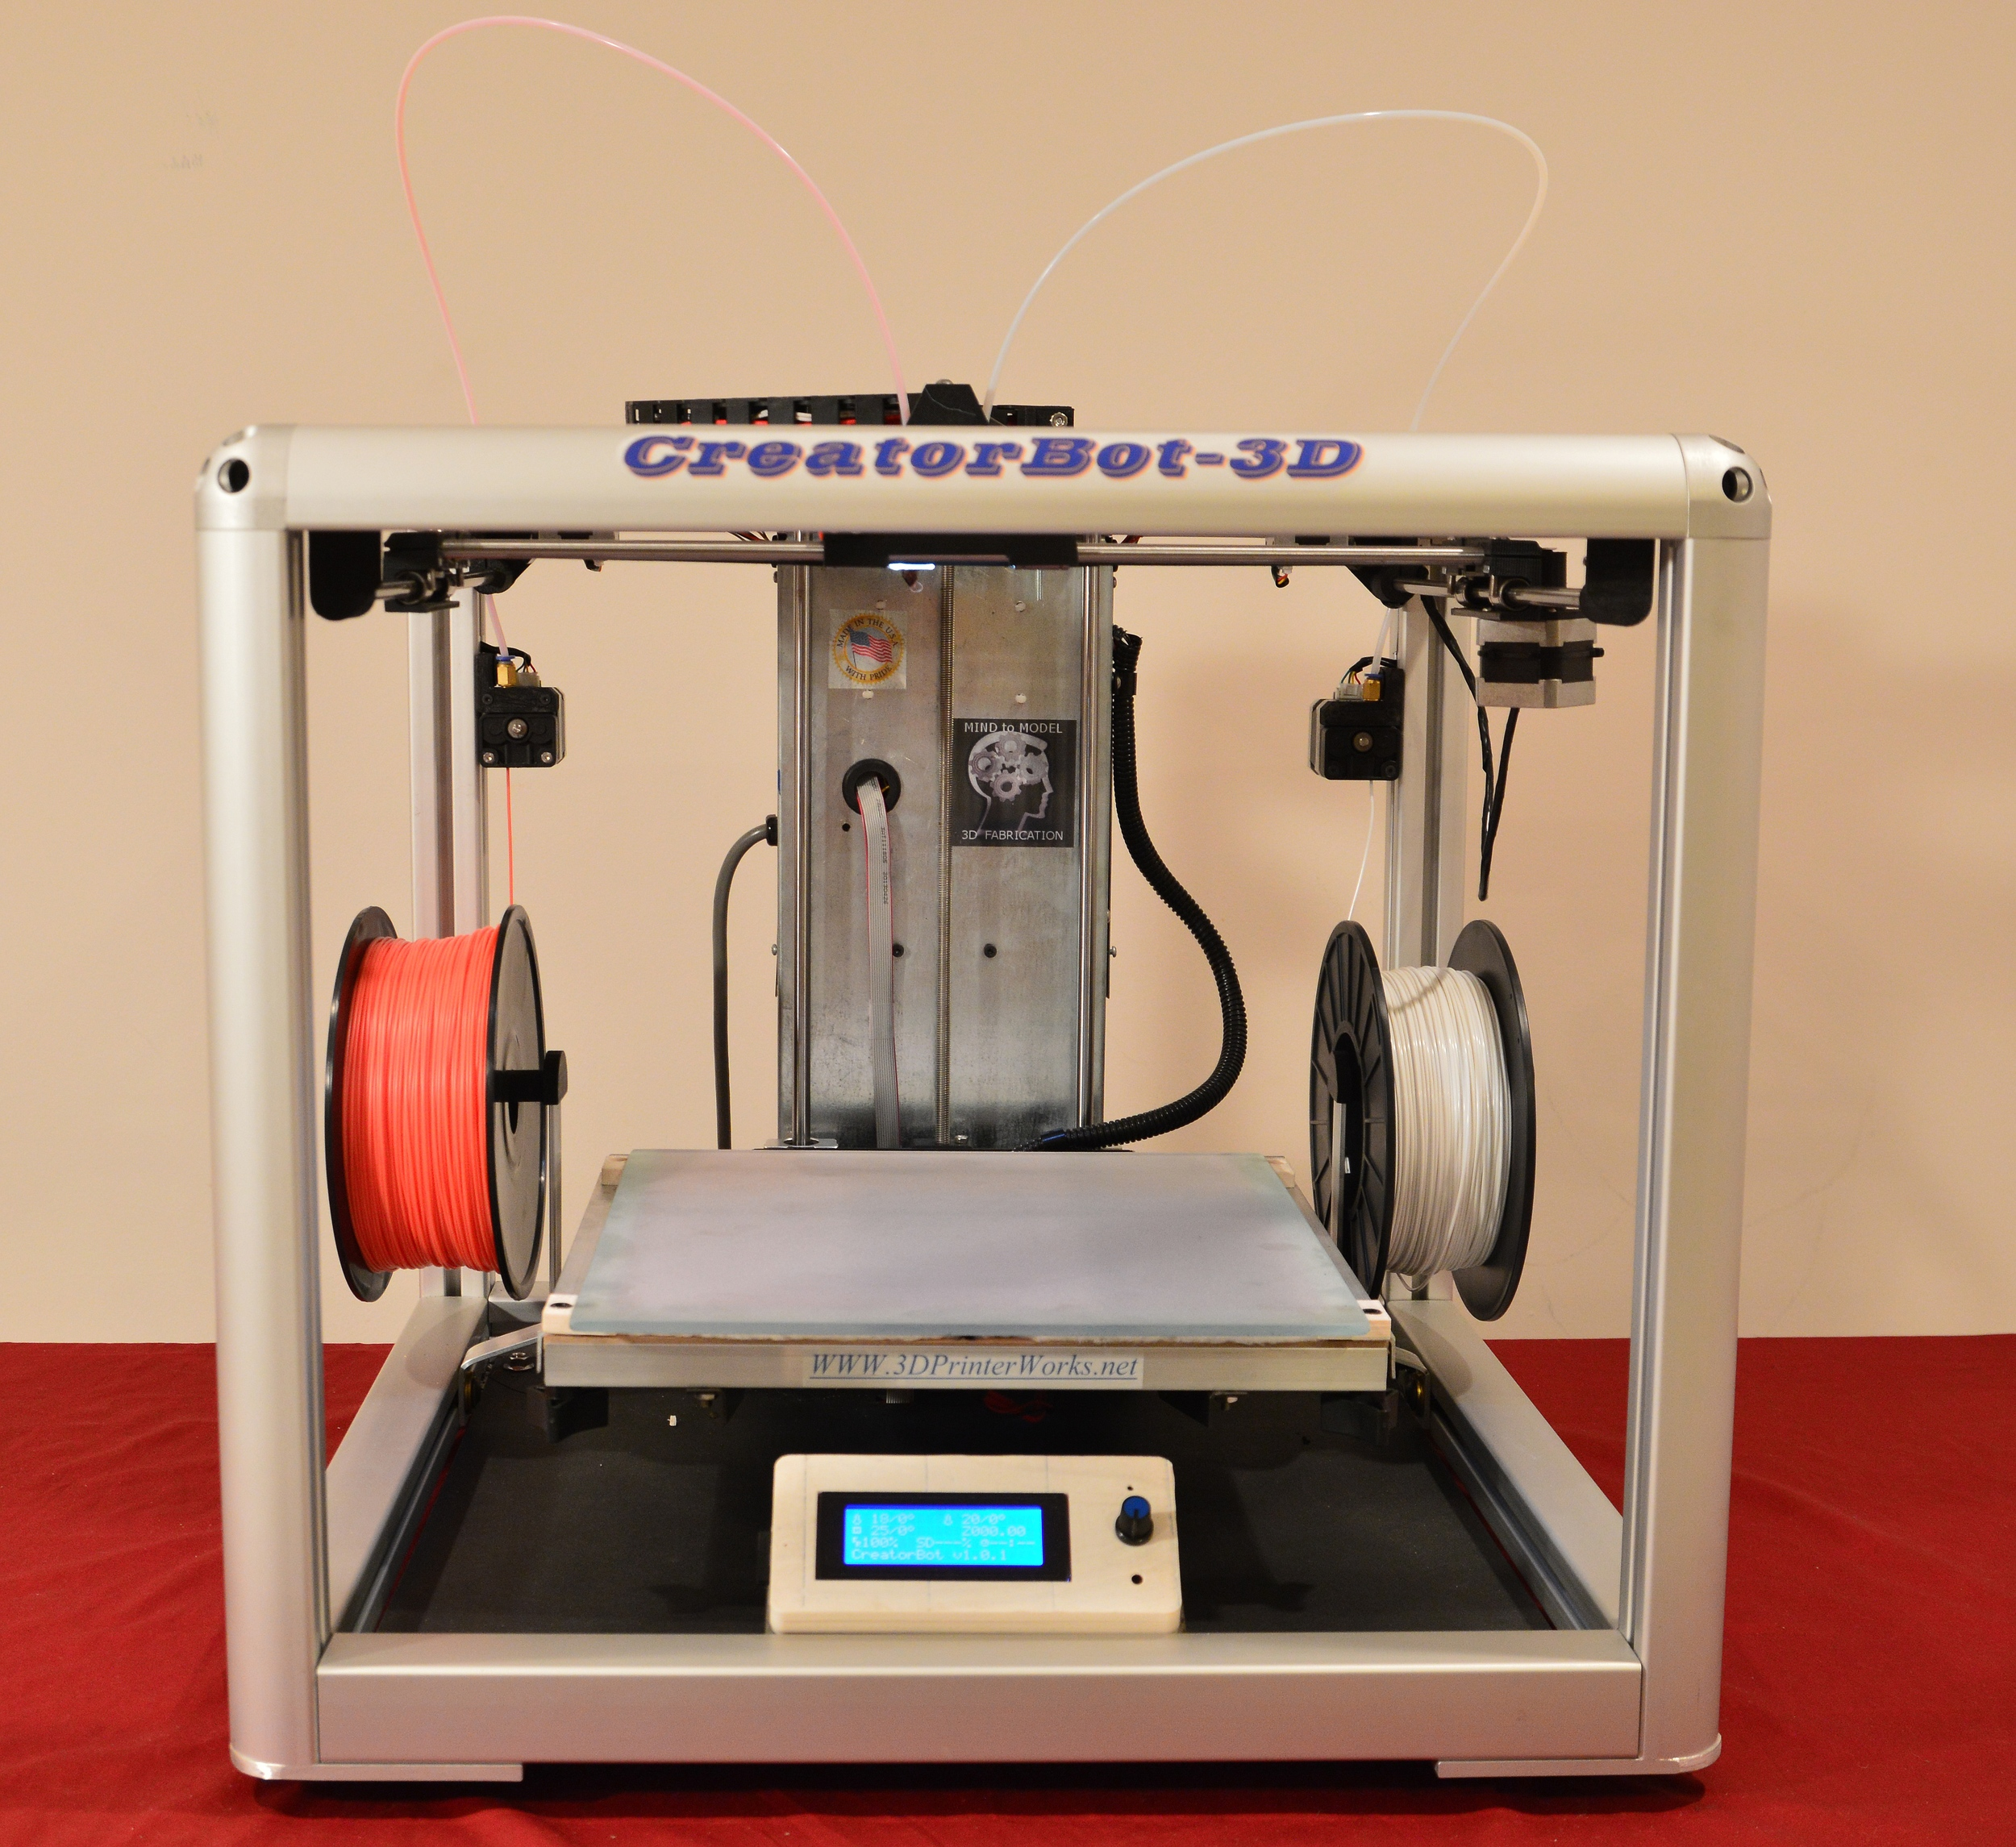 The CreatorBot 3D Printer